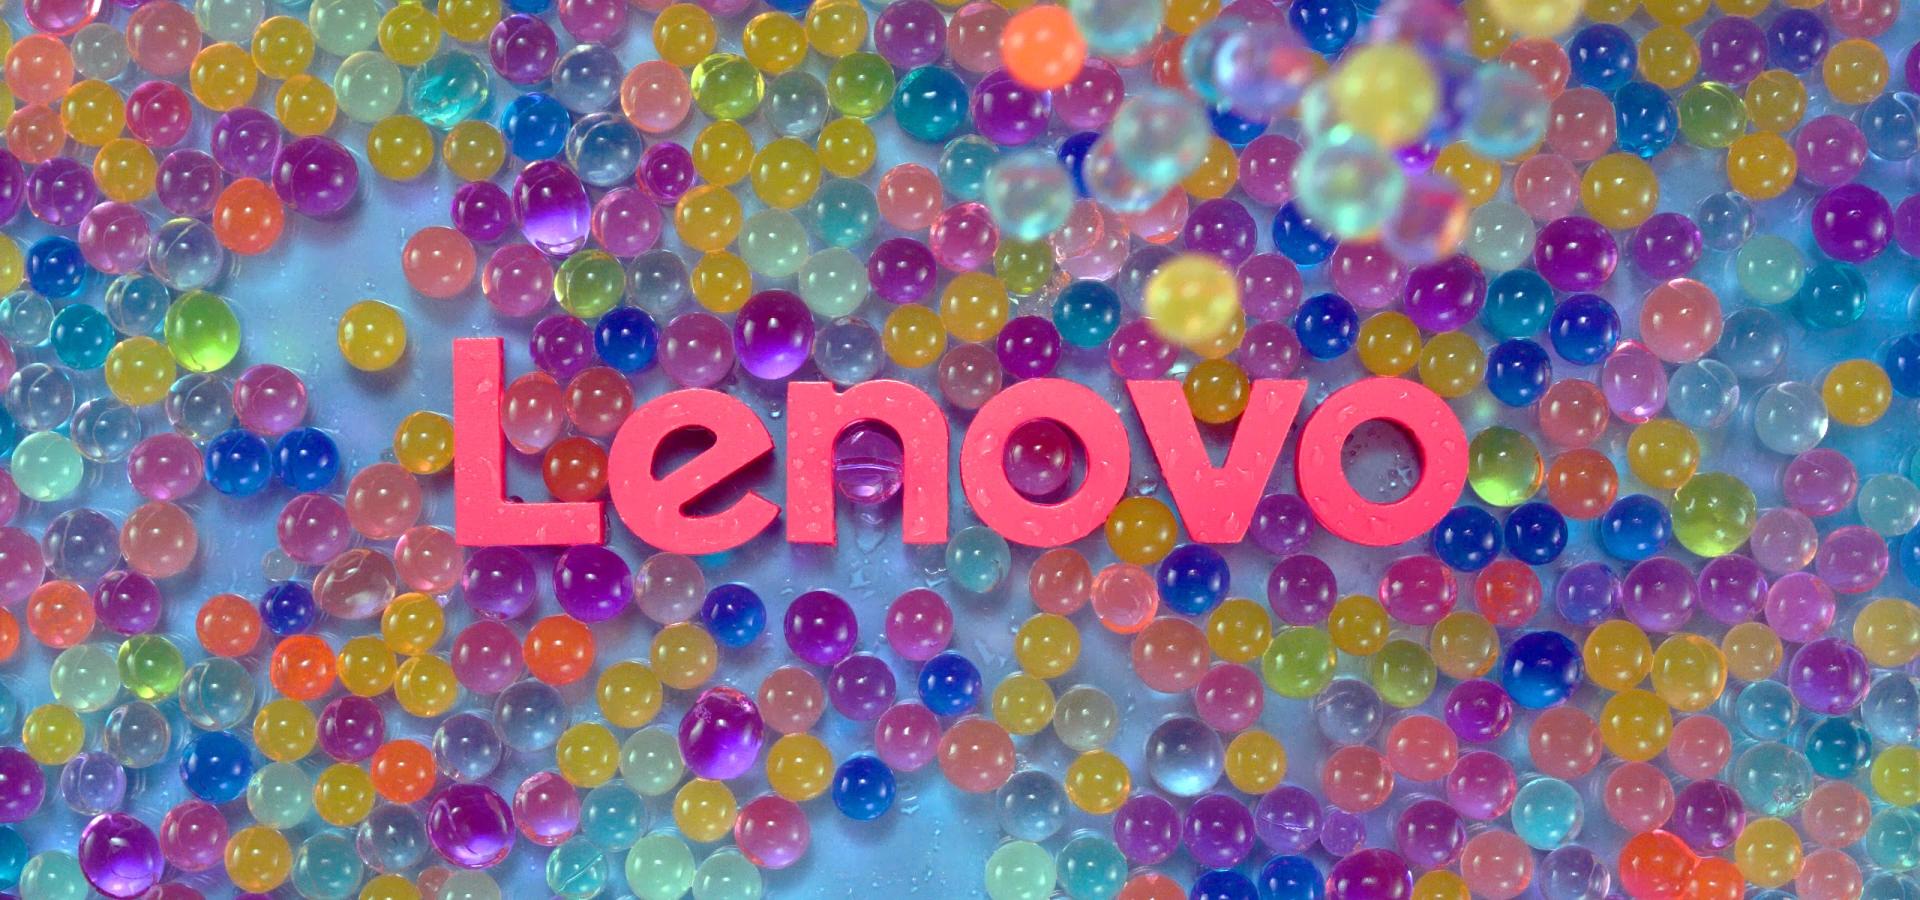 Advertising & Motion: Lenovo - Different is Better